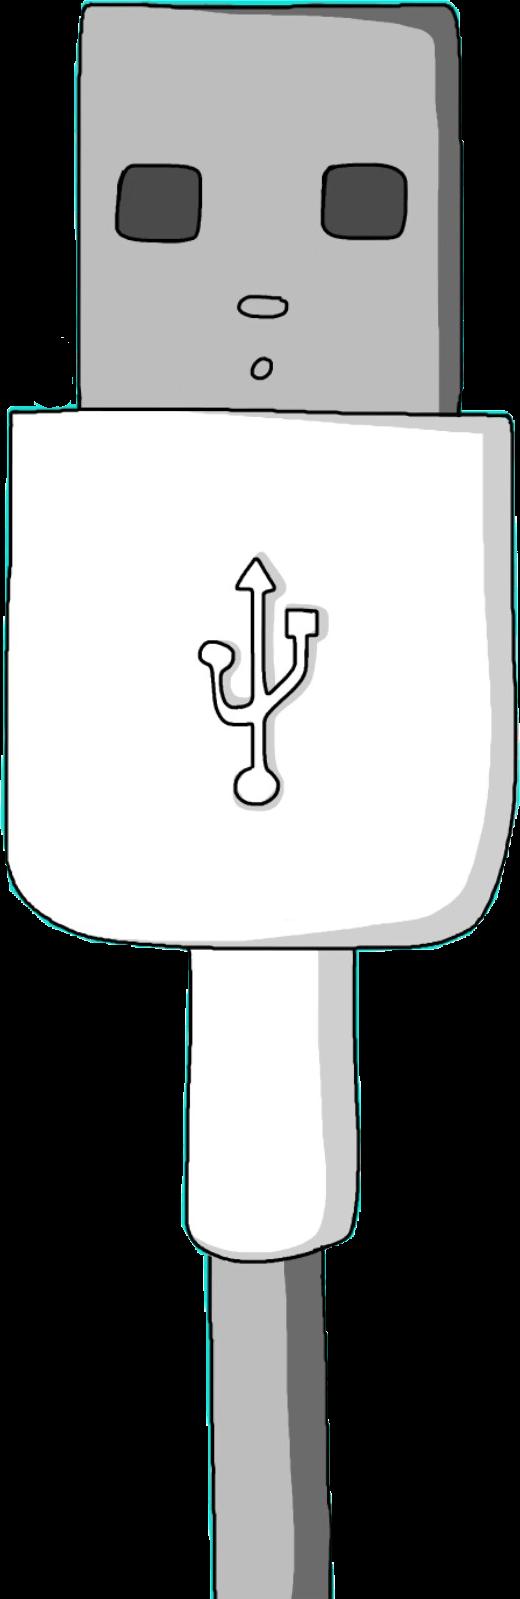 #wire #usb #tech #plug #phone